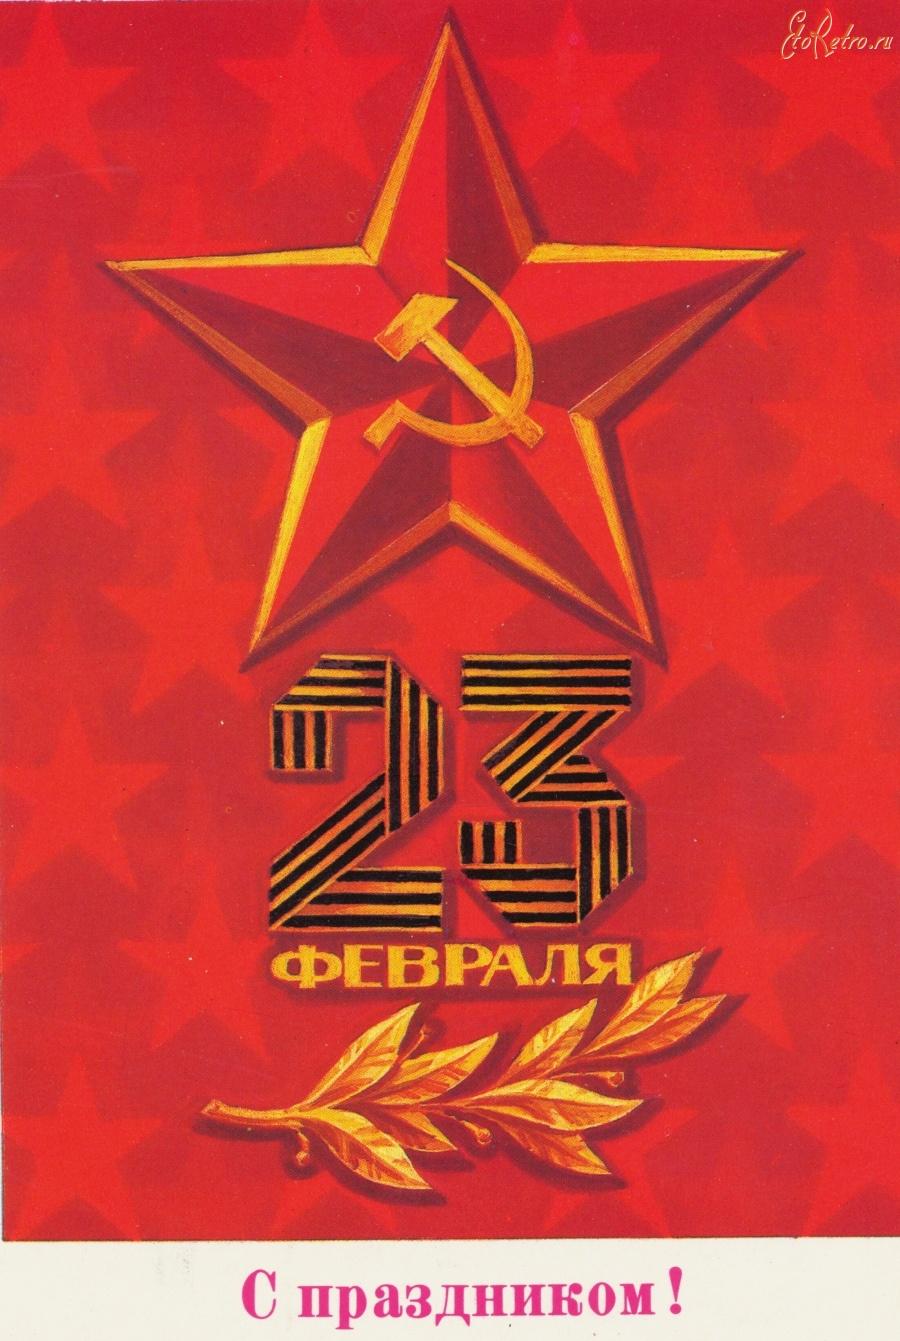 Картинки сигаретах, открытка старая на 23 февраля